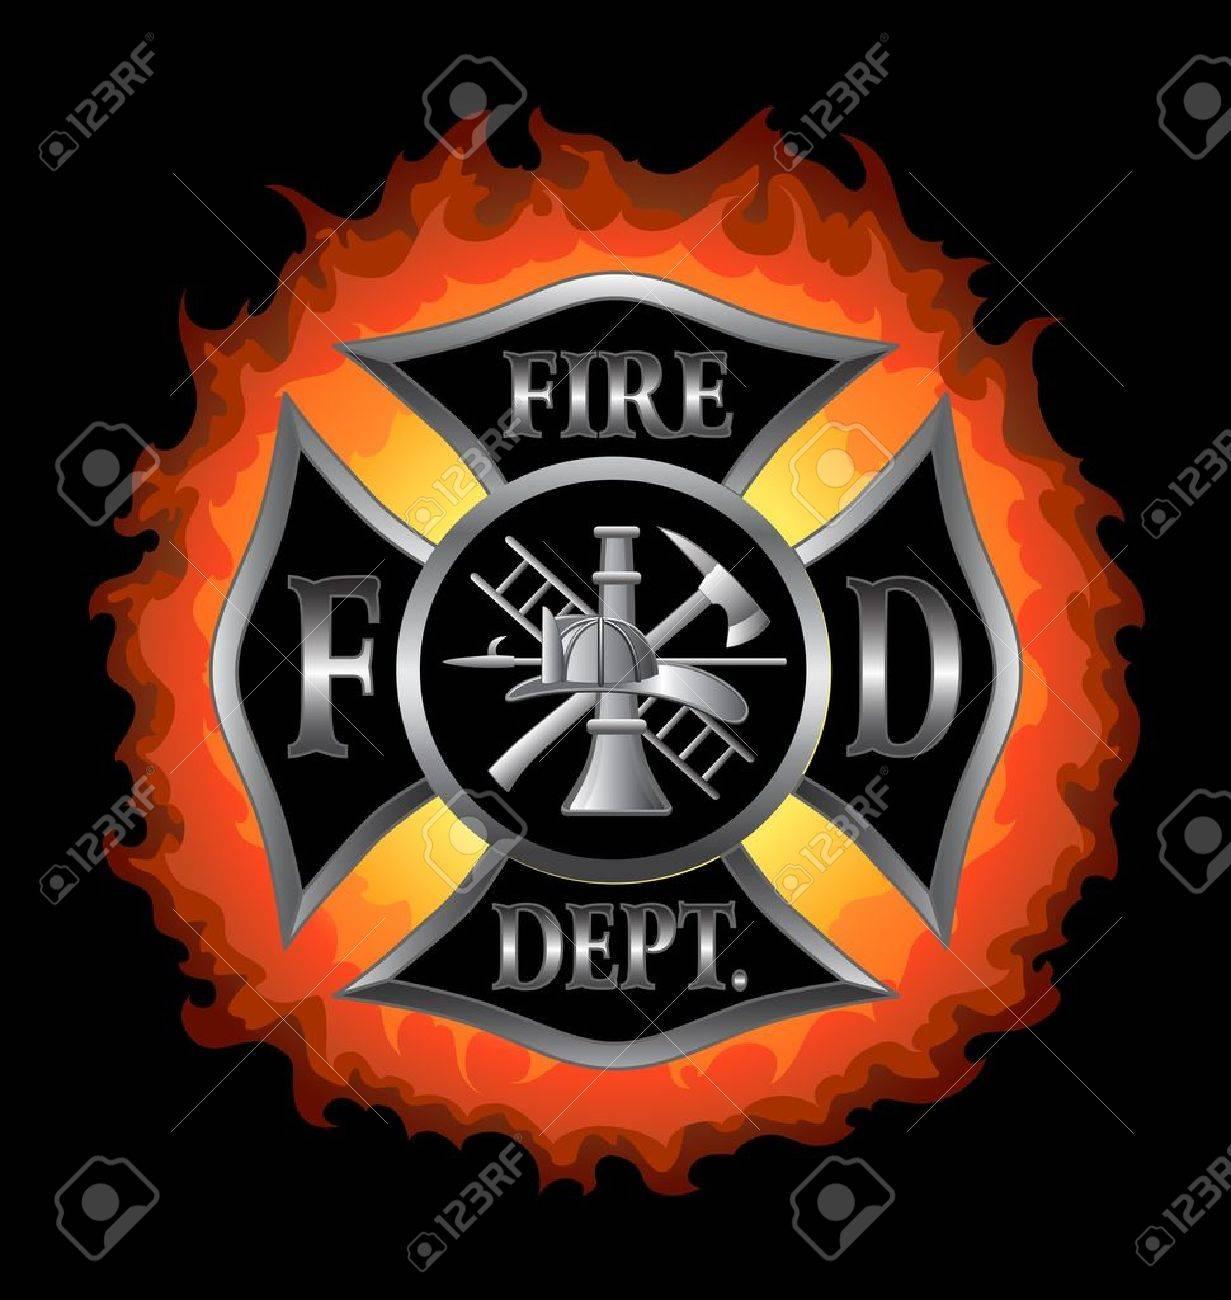 Fire department or firefighter s maltese cross symbol in silver fire department or firefighter s maltese cross symbol in silver with flaming background illustration biocorpaavc